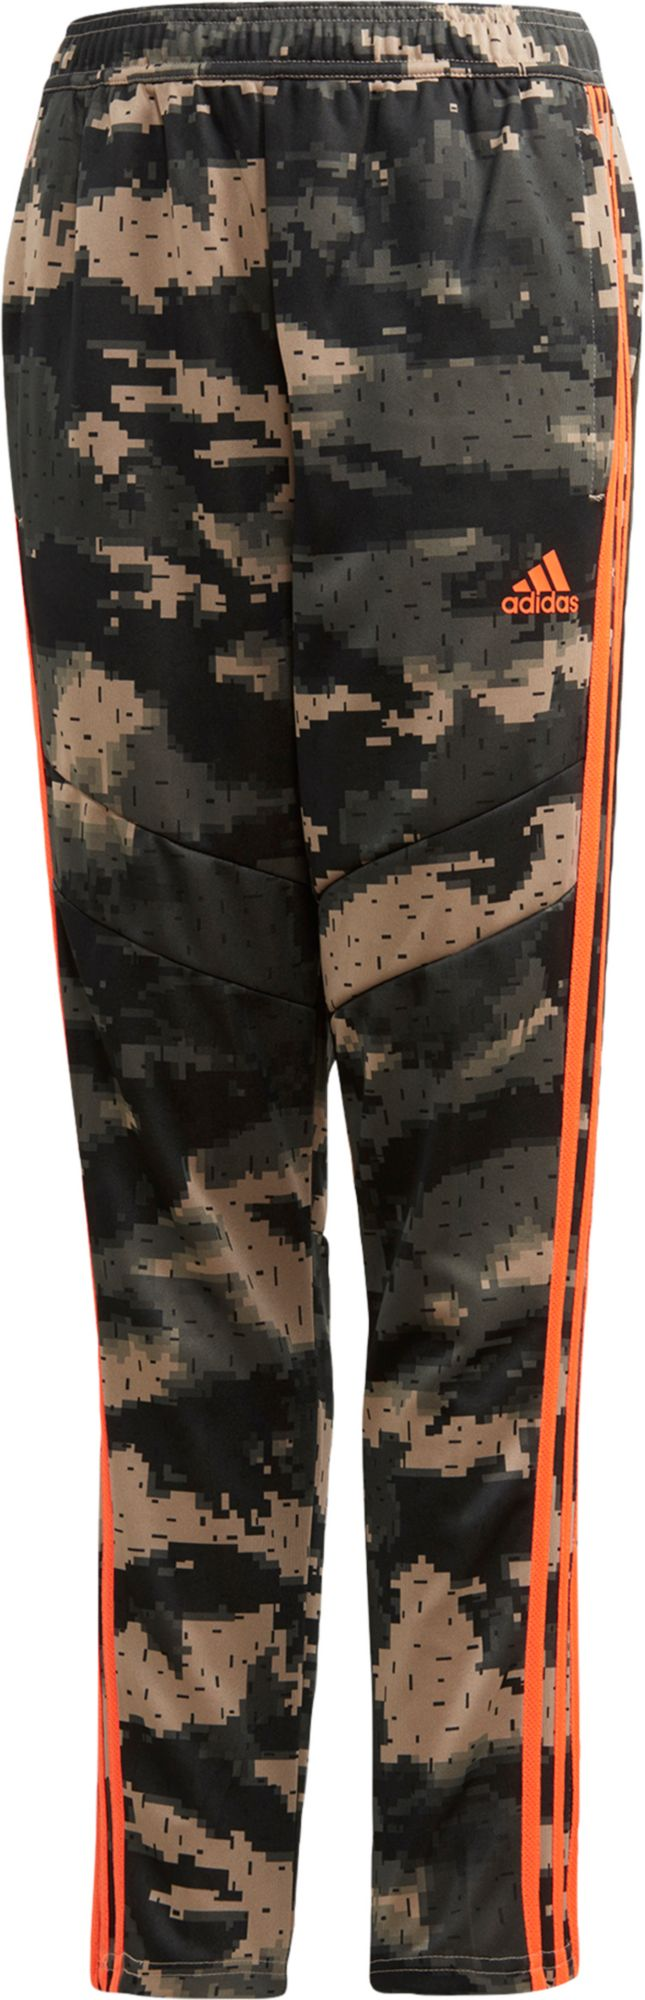 adidas Boy's Tiro 19 Camo Training Pants, Size: XL, Green thumbnail